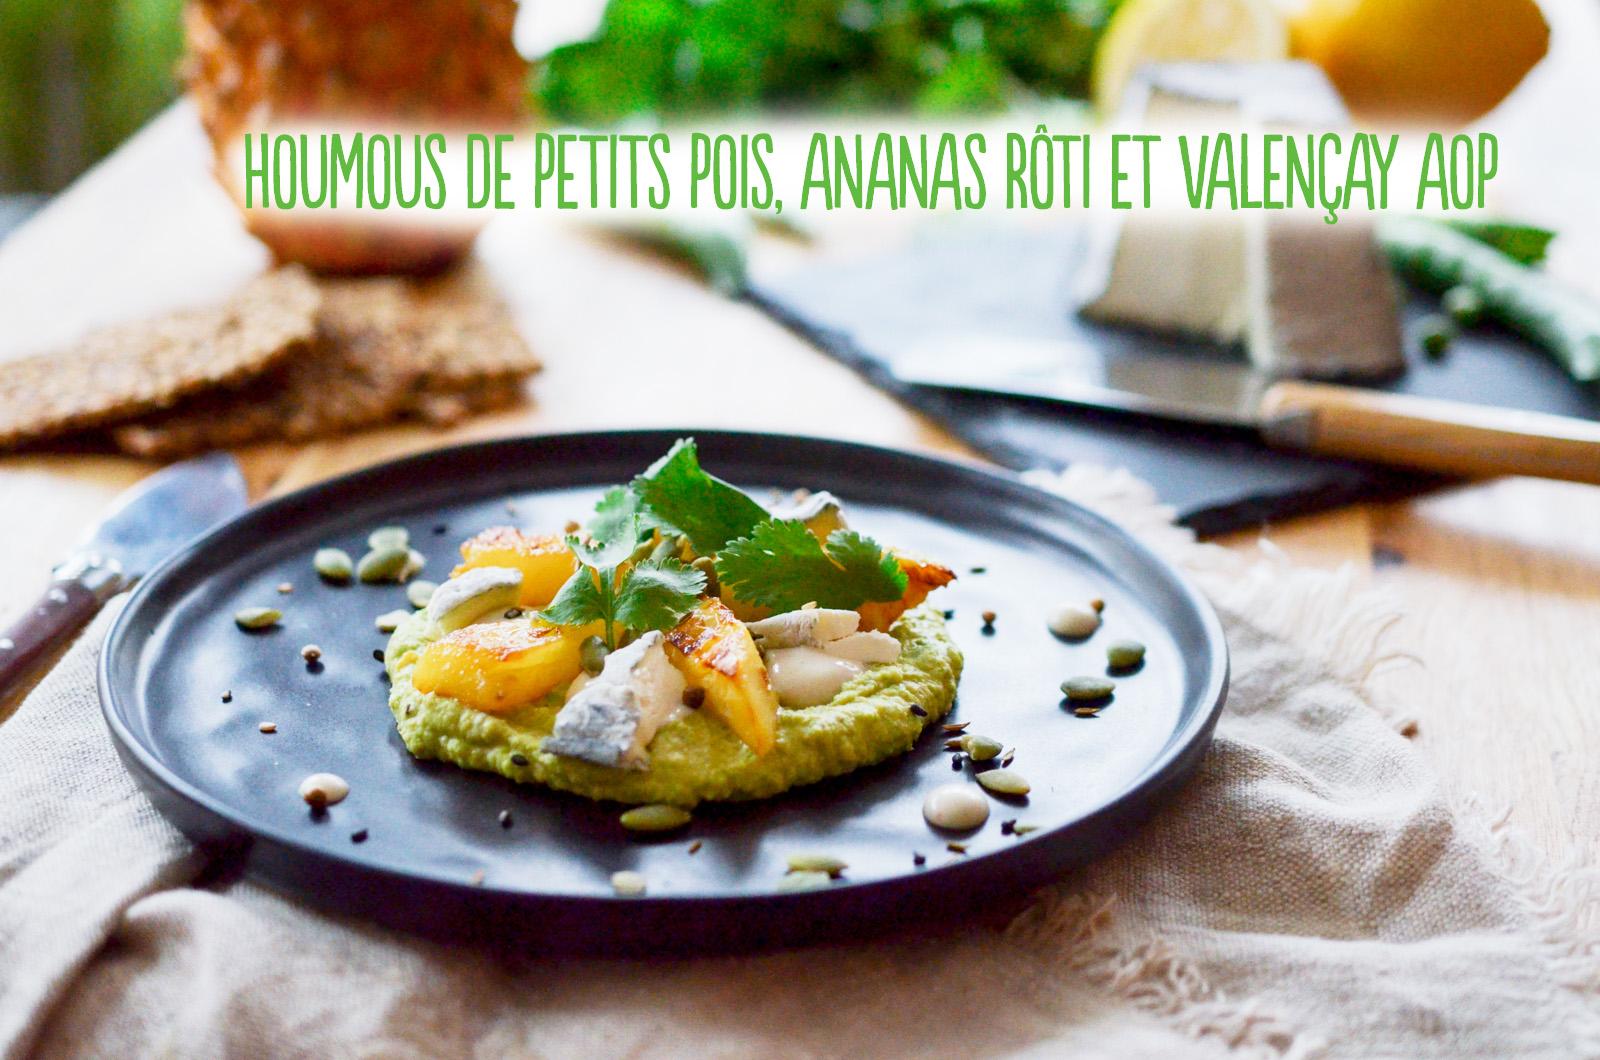 Houmous de petits pois, ananas rôti et Valençay AOP